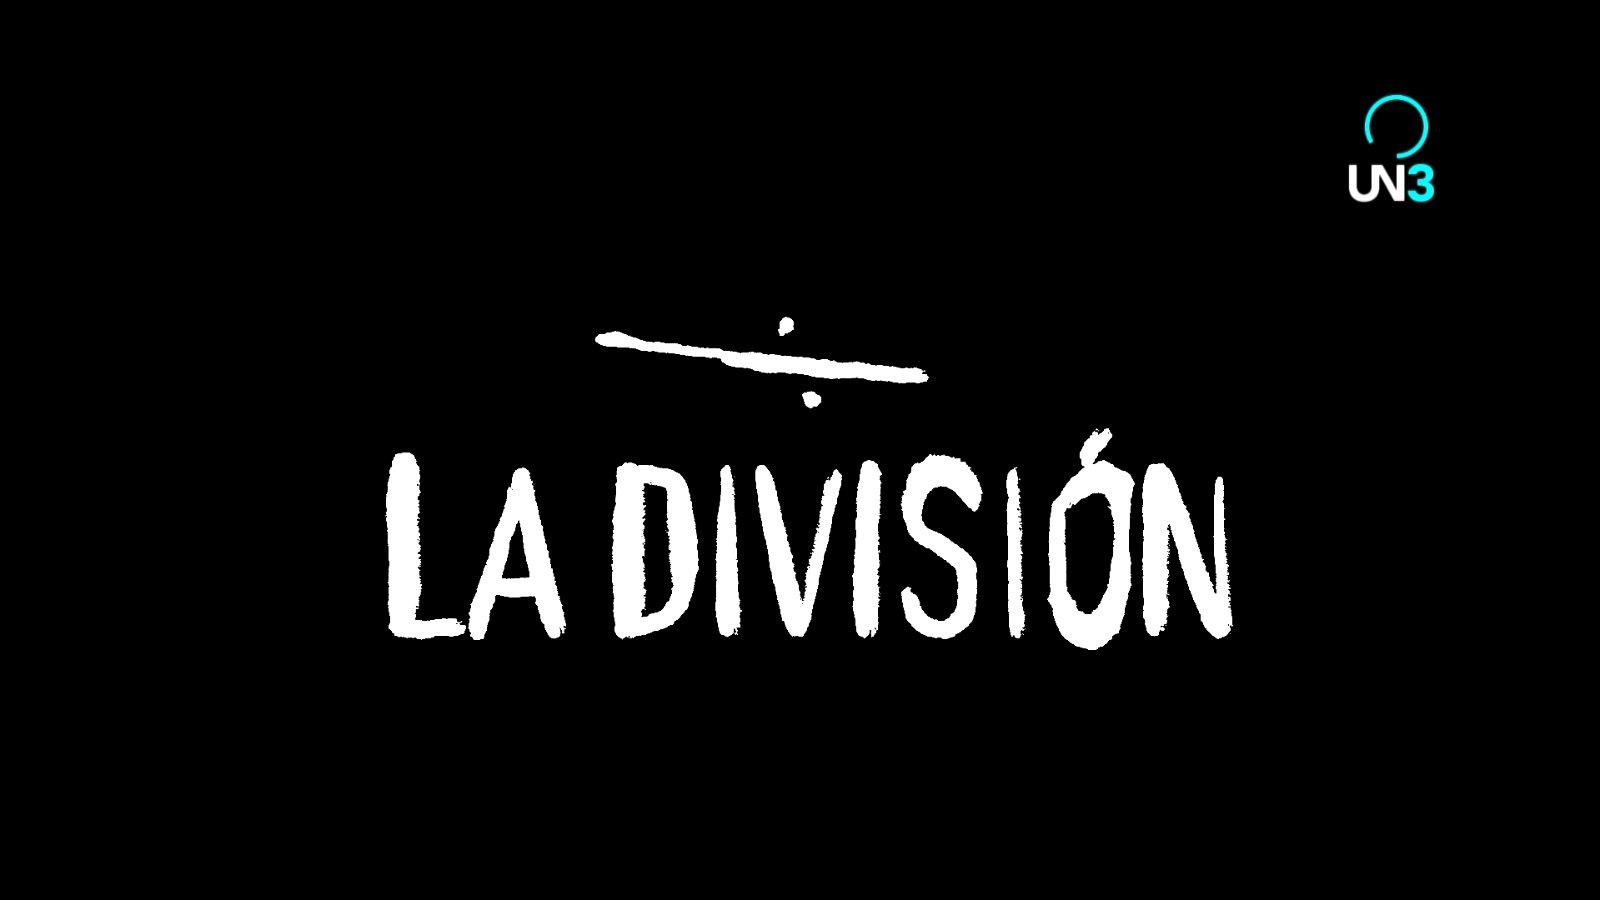 Roma Web Fest - LA DIVISIÓN // THE DIVISION